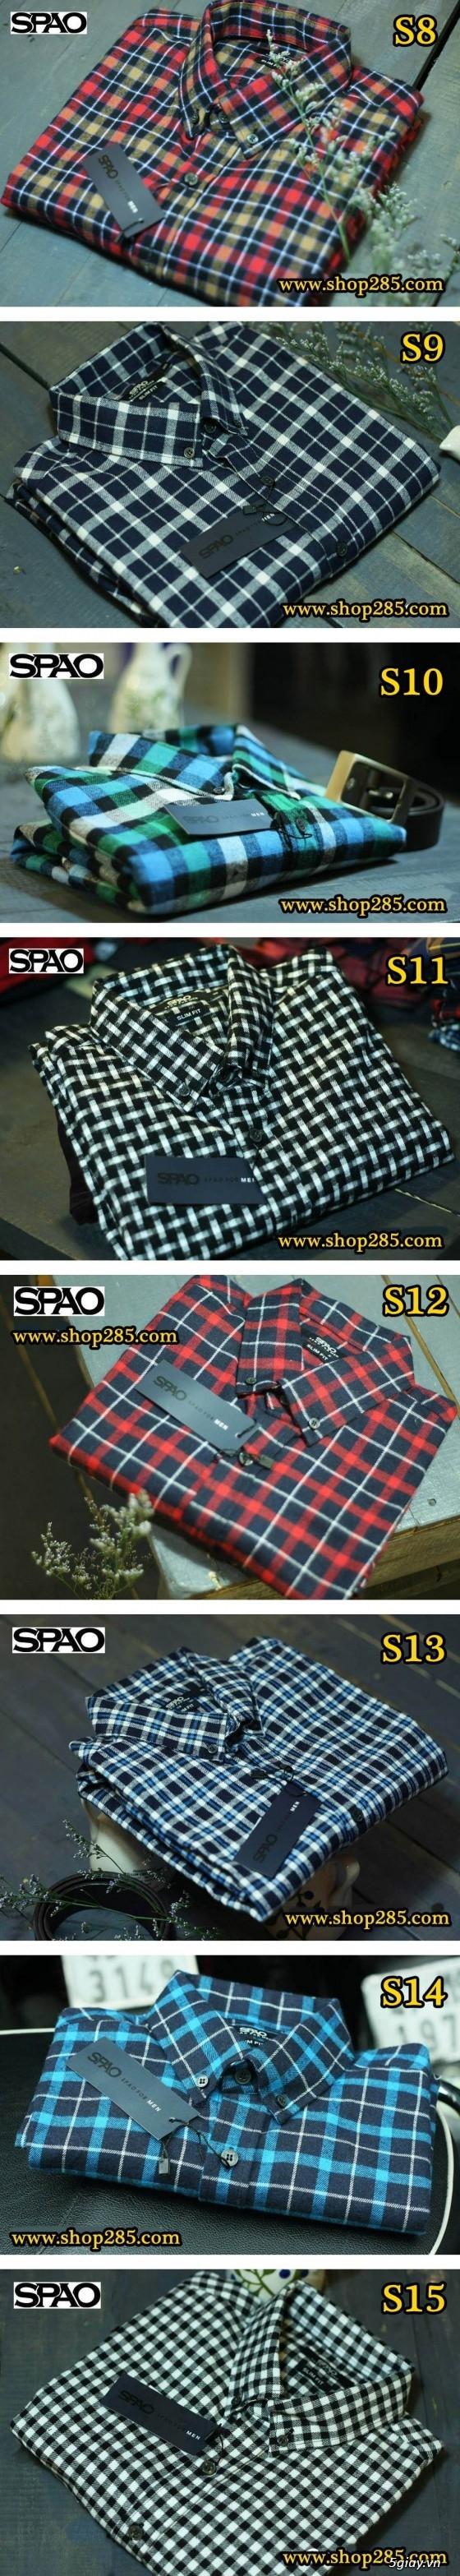 Áo thun Hollister VNXK,áo thun SuperDry VNXK ,áo A&F VNXK ,áo thun cổ tim thun láng - 2